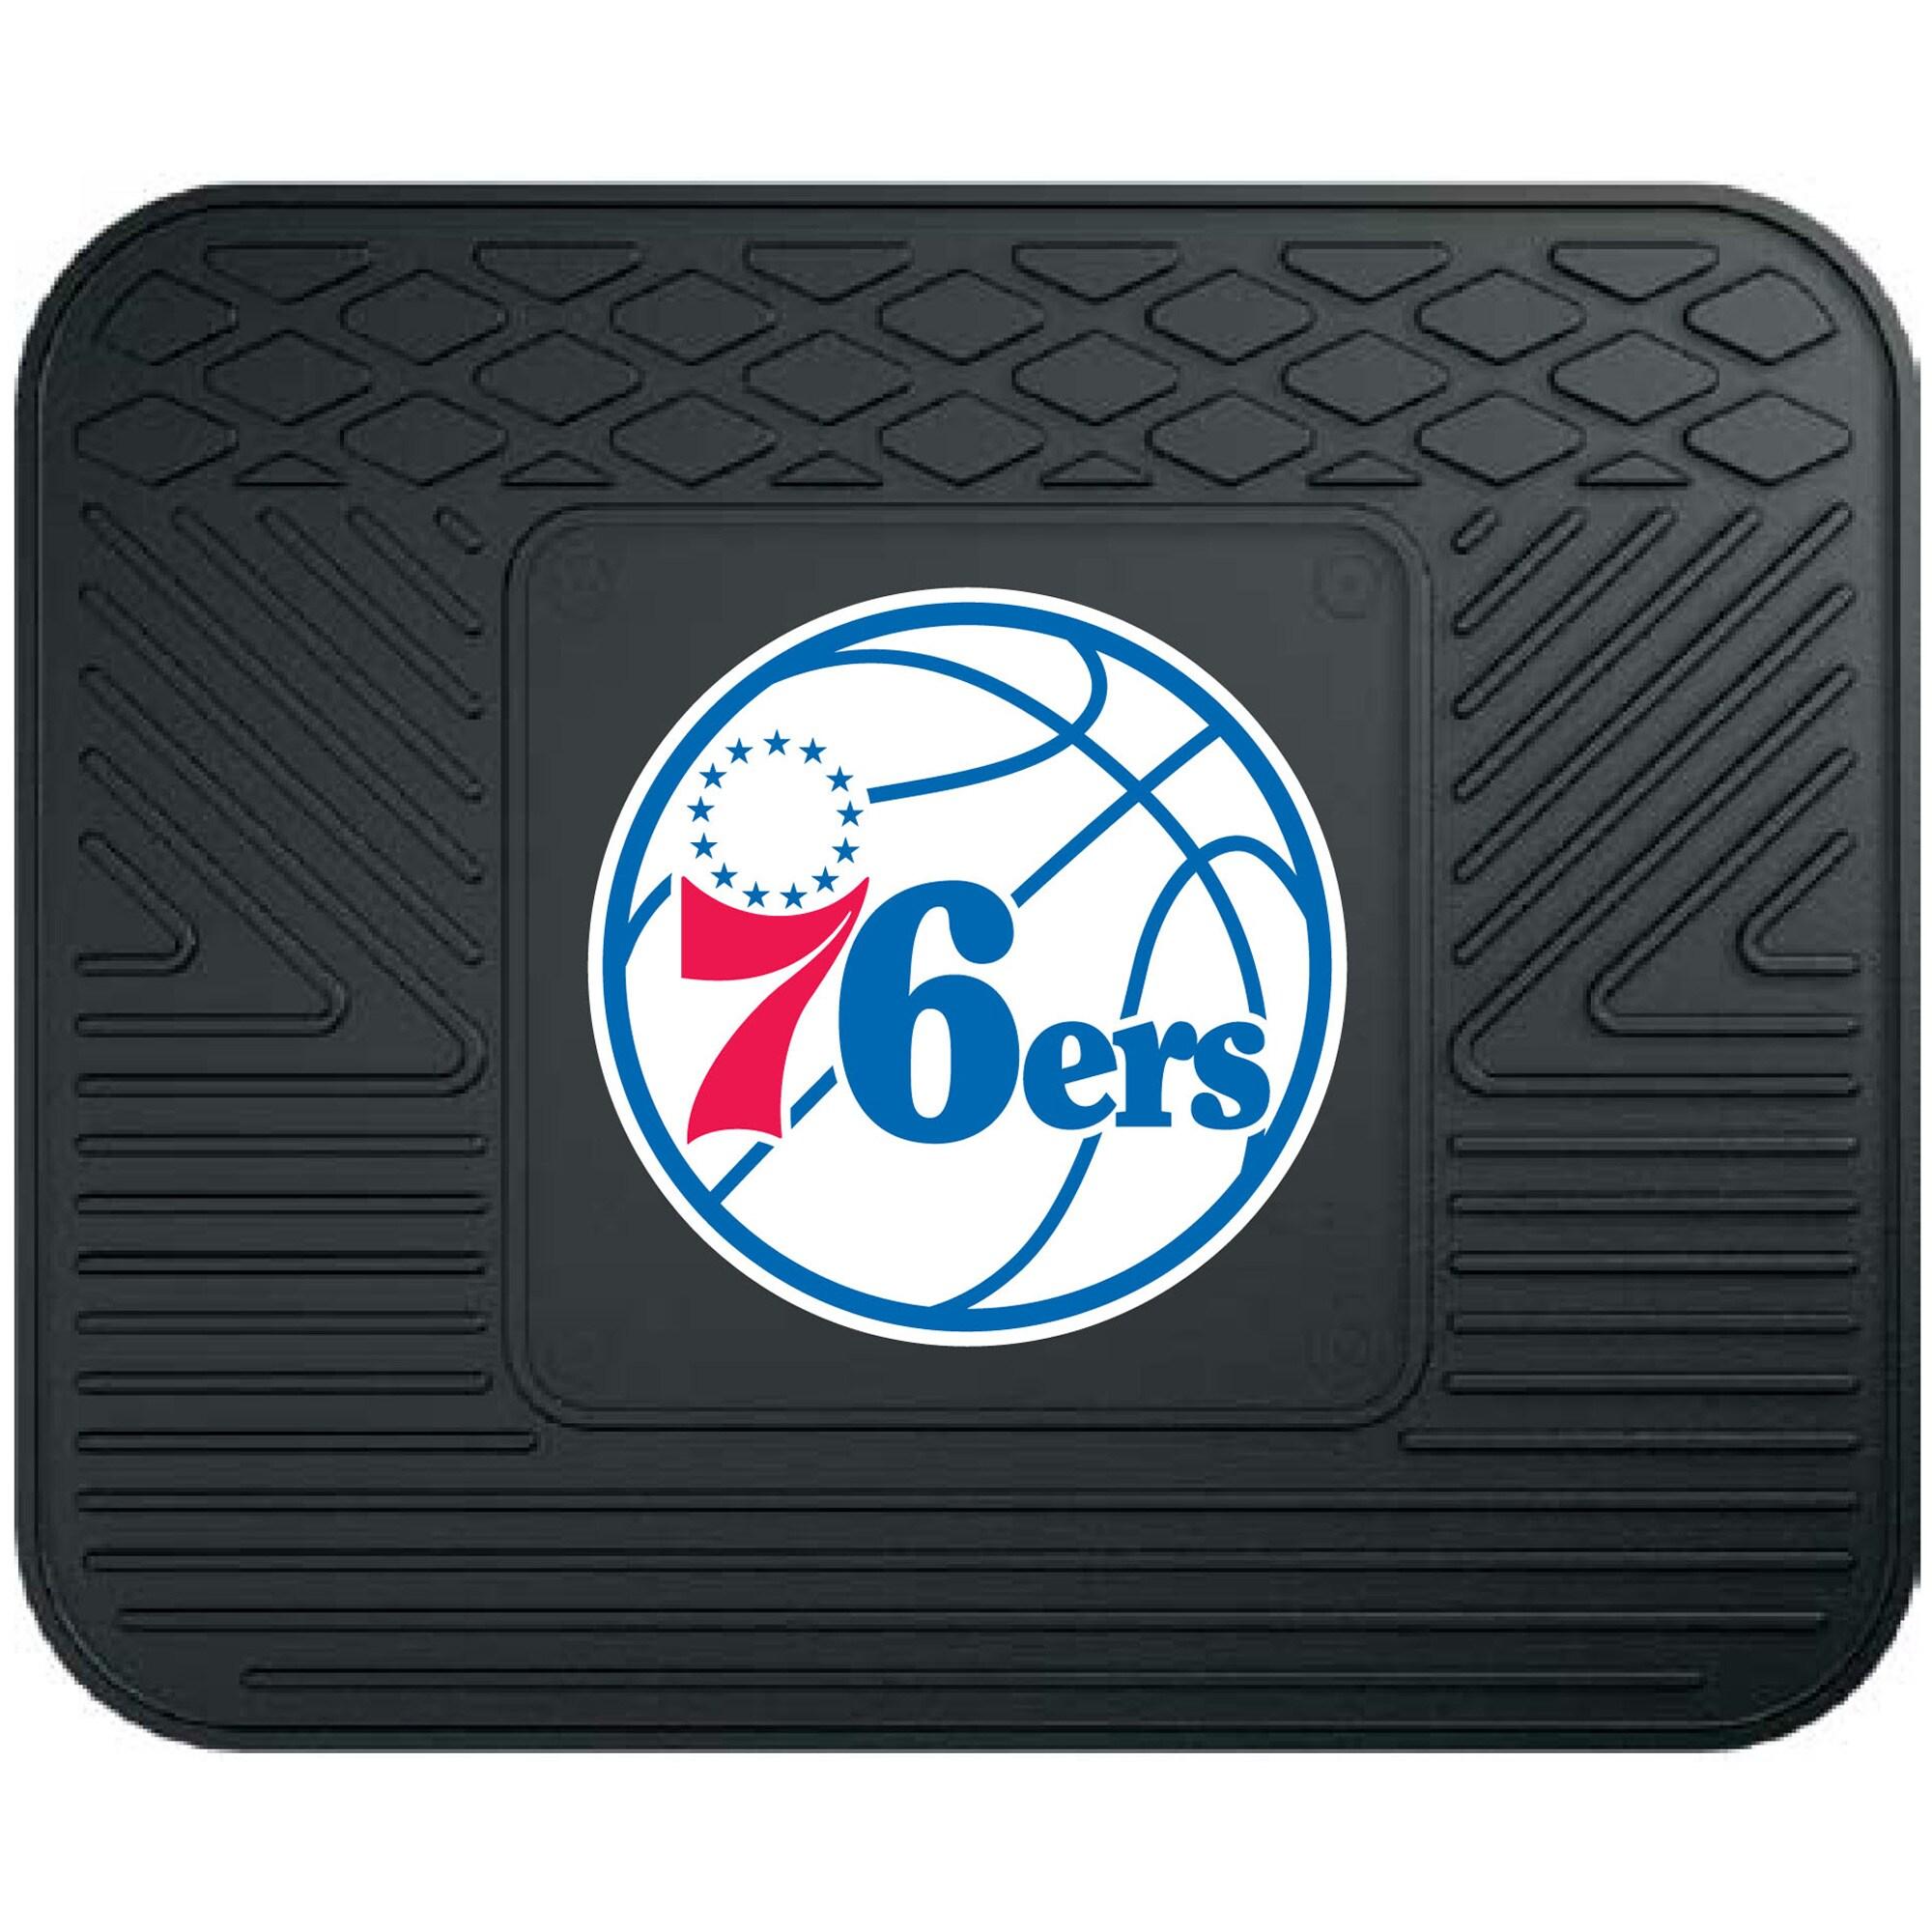 "Philadelphia 76ers 17"" x 14"" Utility Mat"